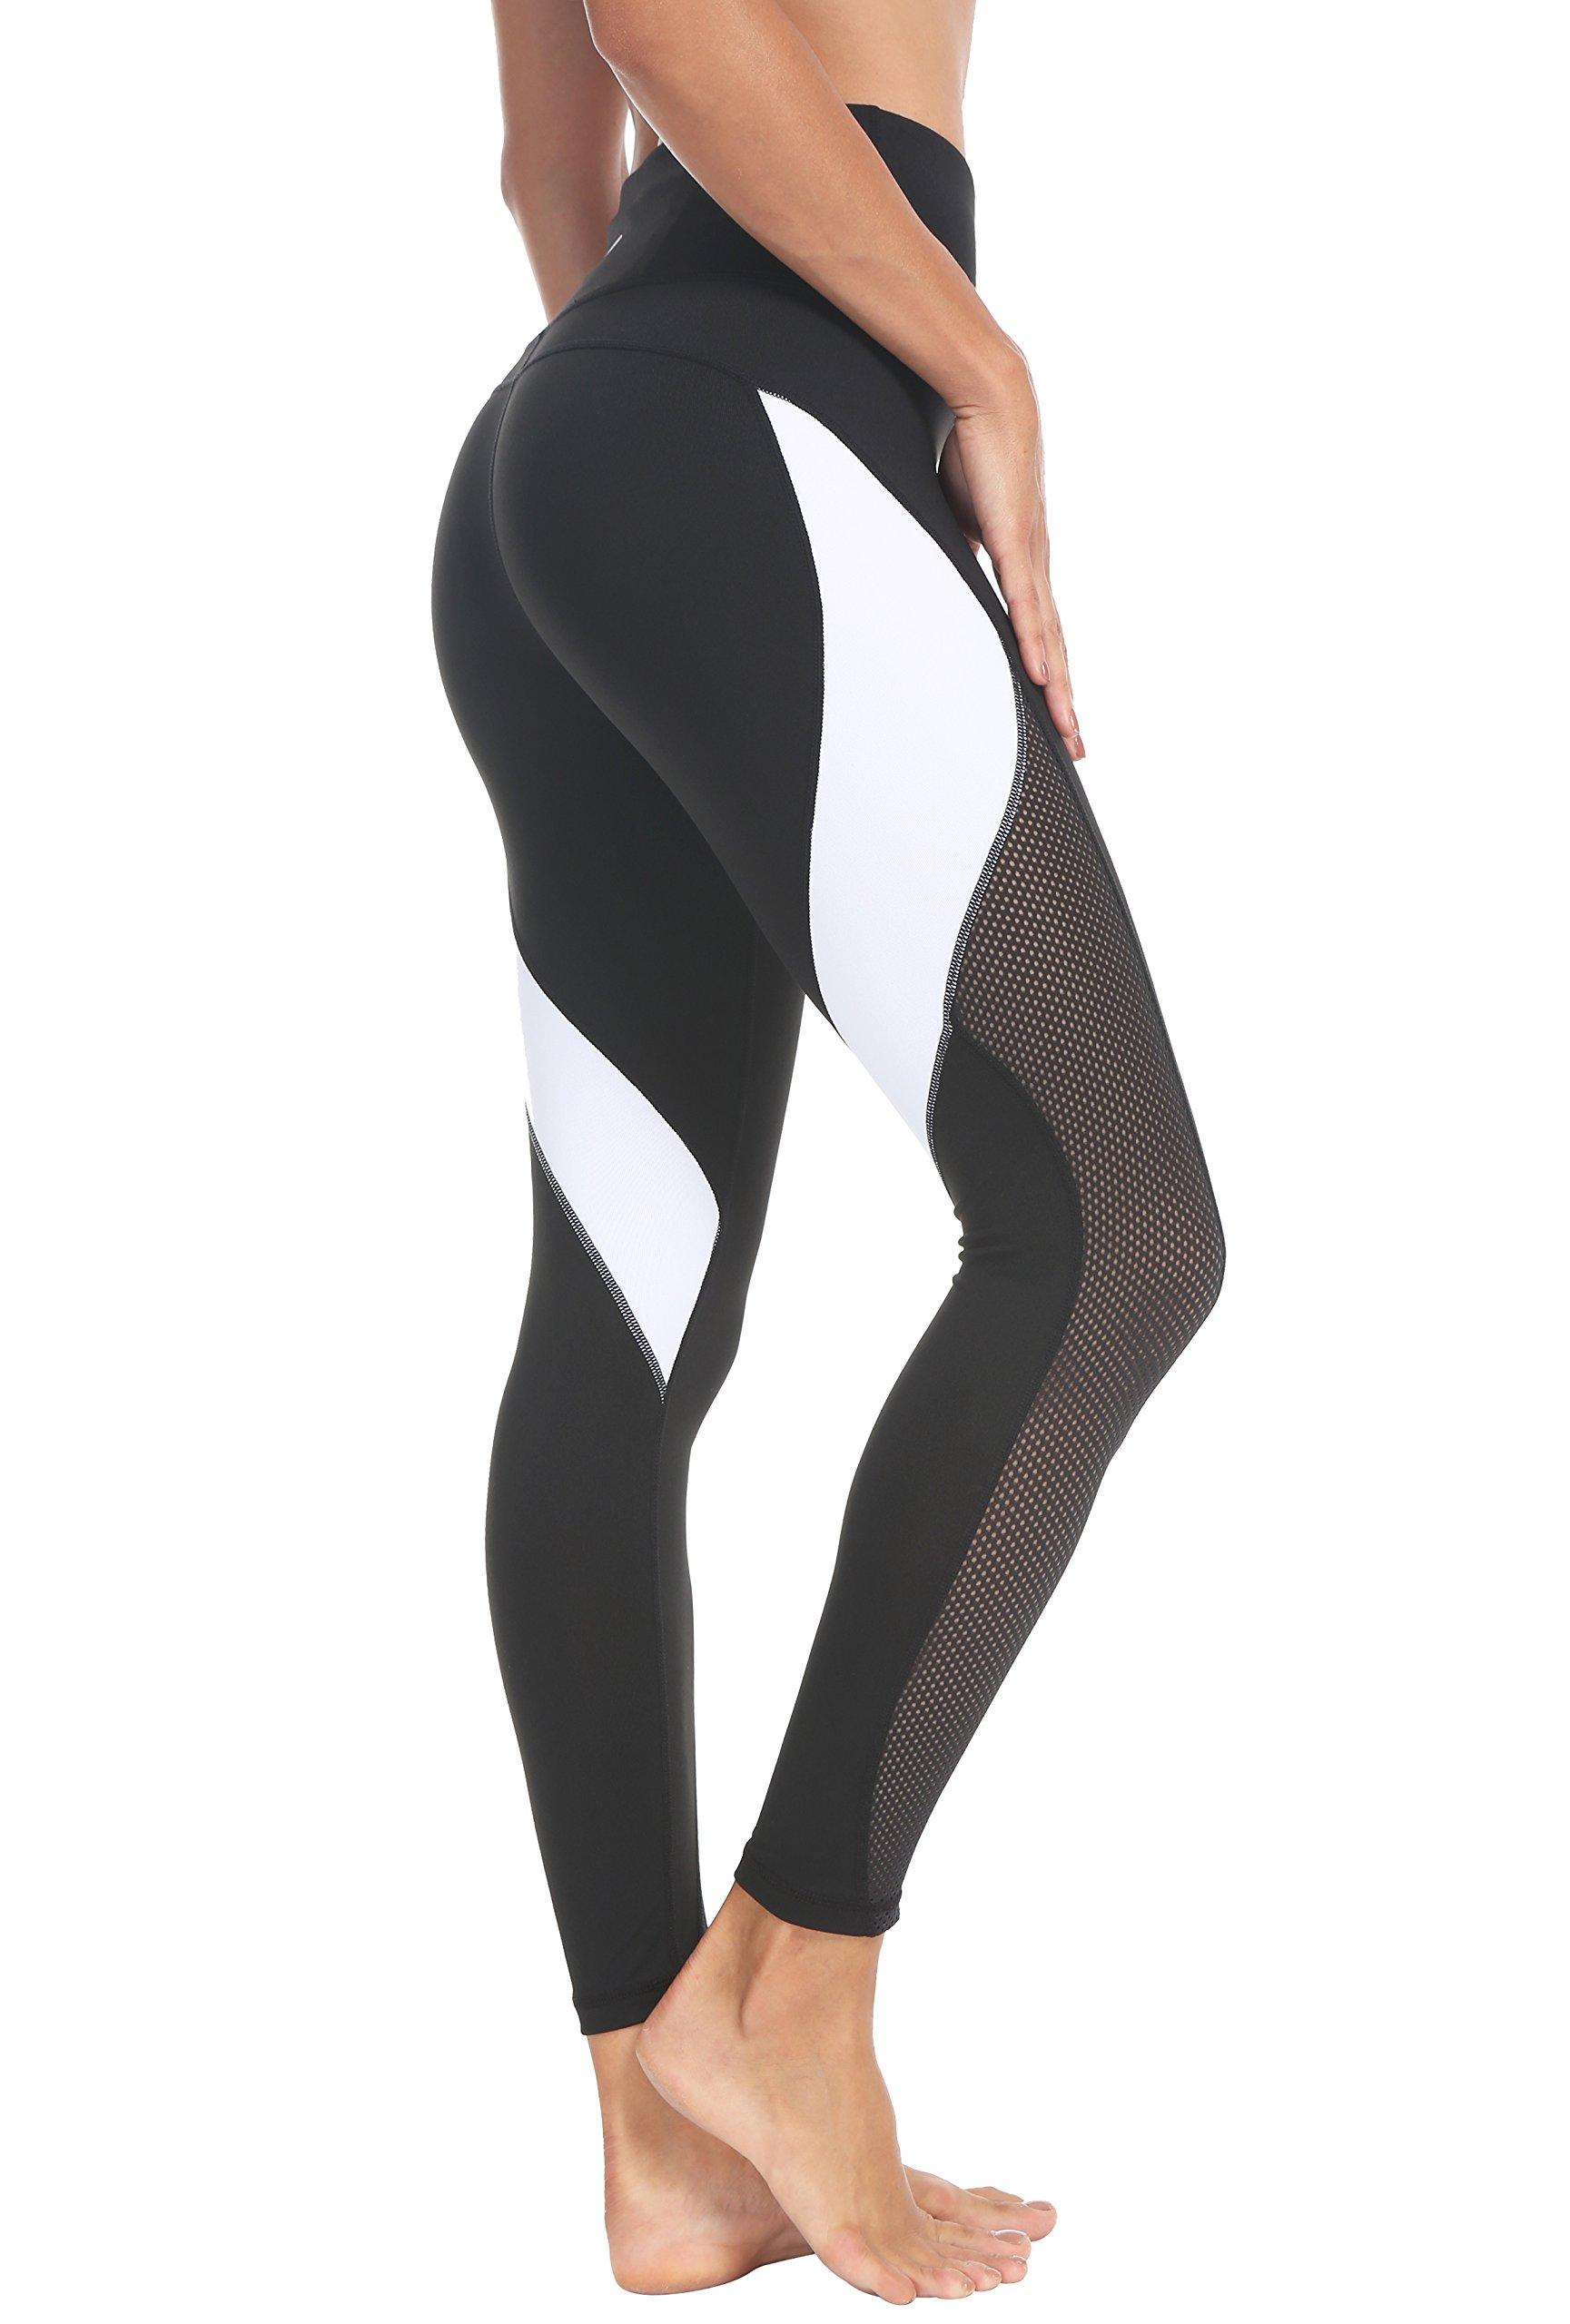 Queenie Ke Women Yoga Pants Color Blocking Mesh Workout Running Leggings Tights Size M Color Black